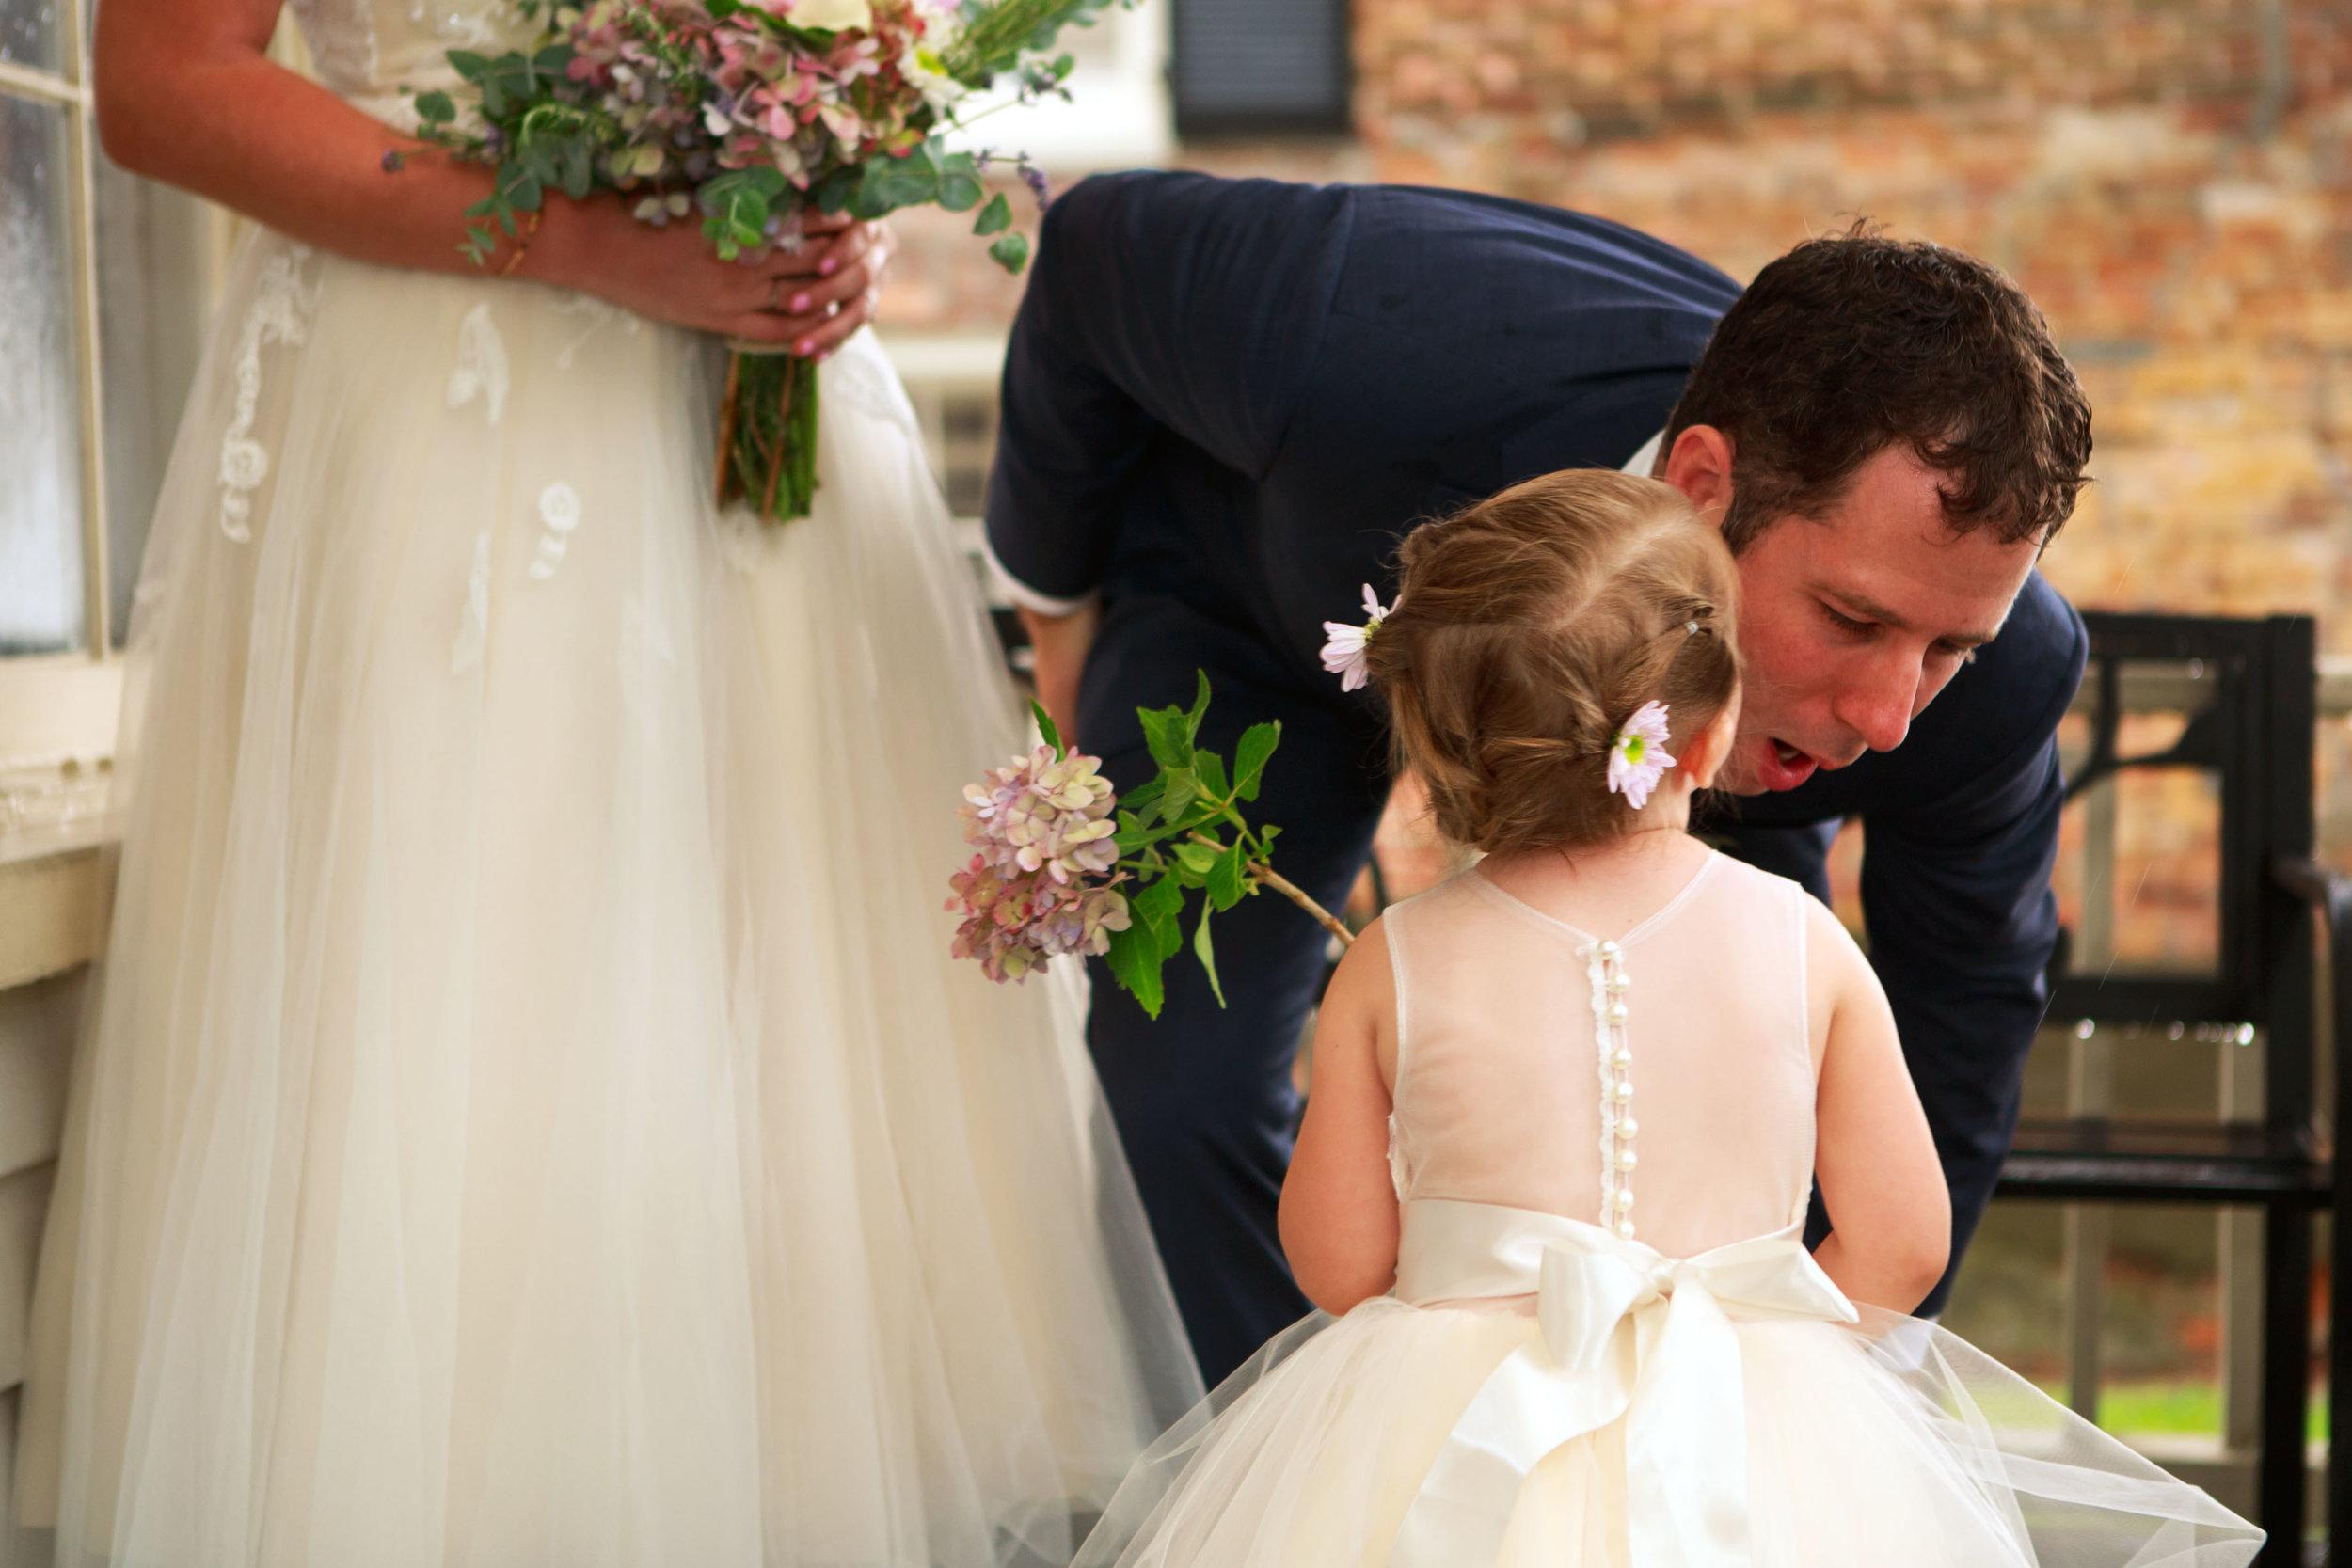 128-South-Wedding-Tiffany-Abruzzo-Photography-First-Look-13.jpg